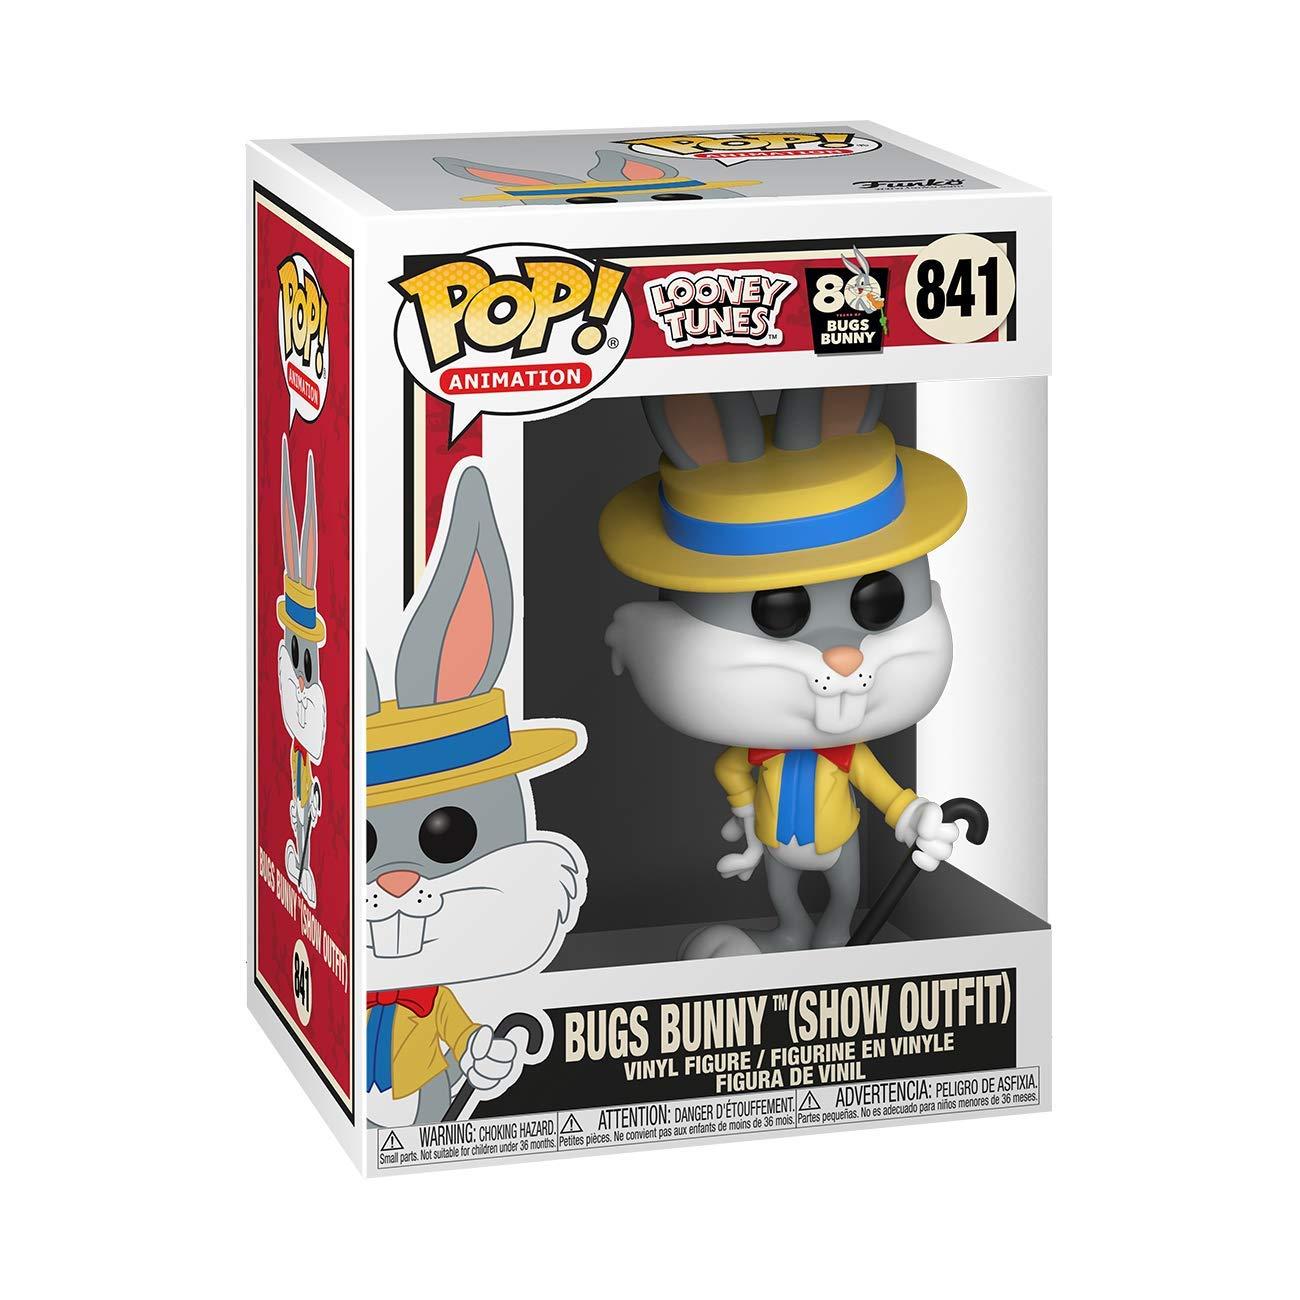 Looney Tunes Romper 36 Months